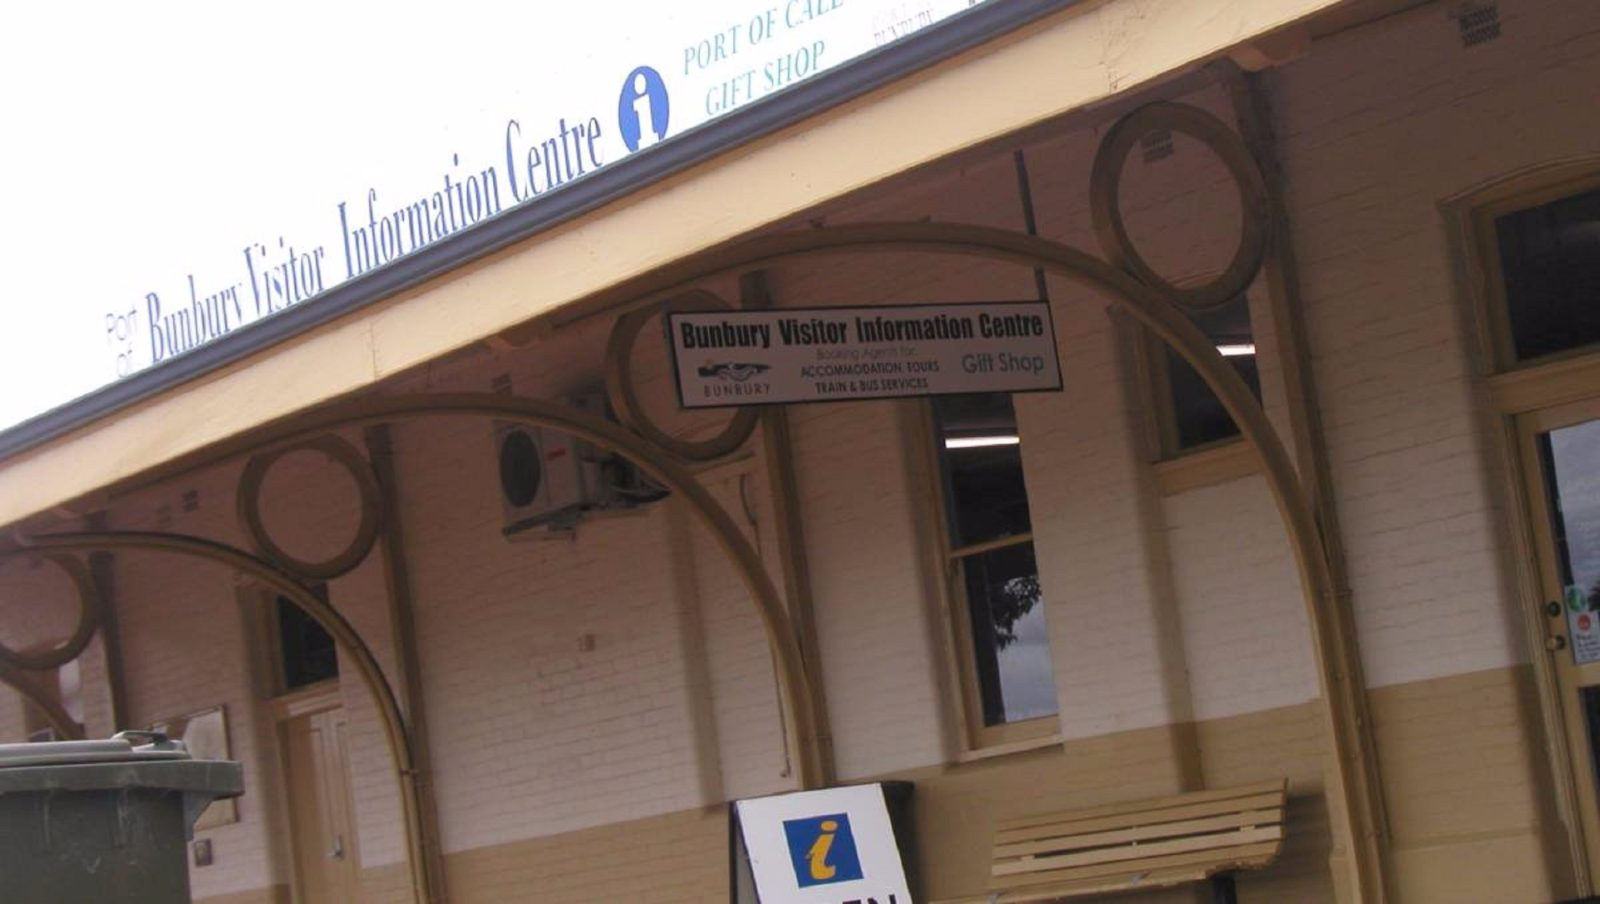 Bunbury Visitor Centre, Bunbury, Western Australia